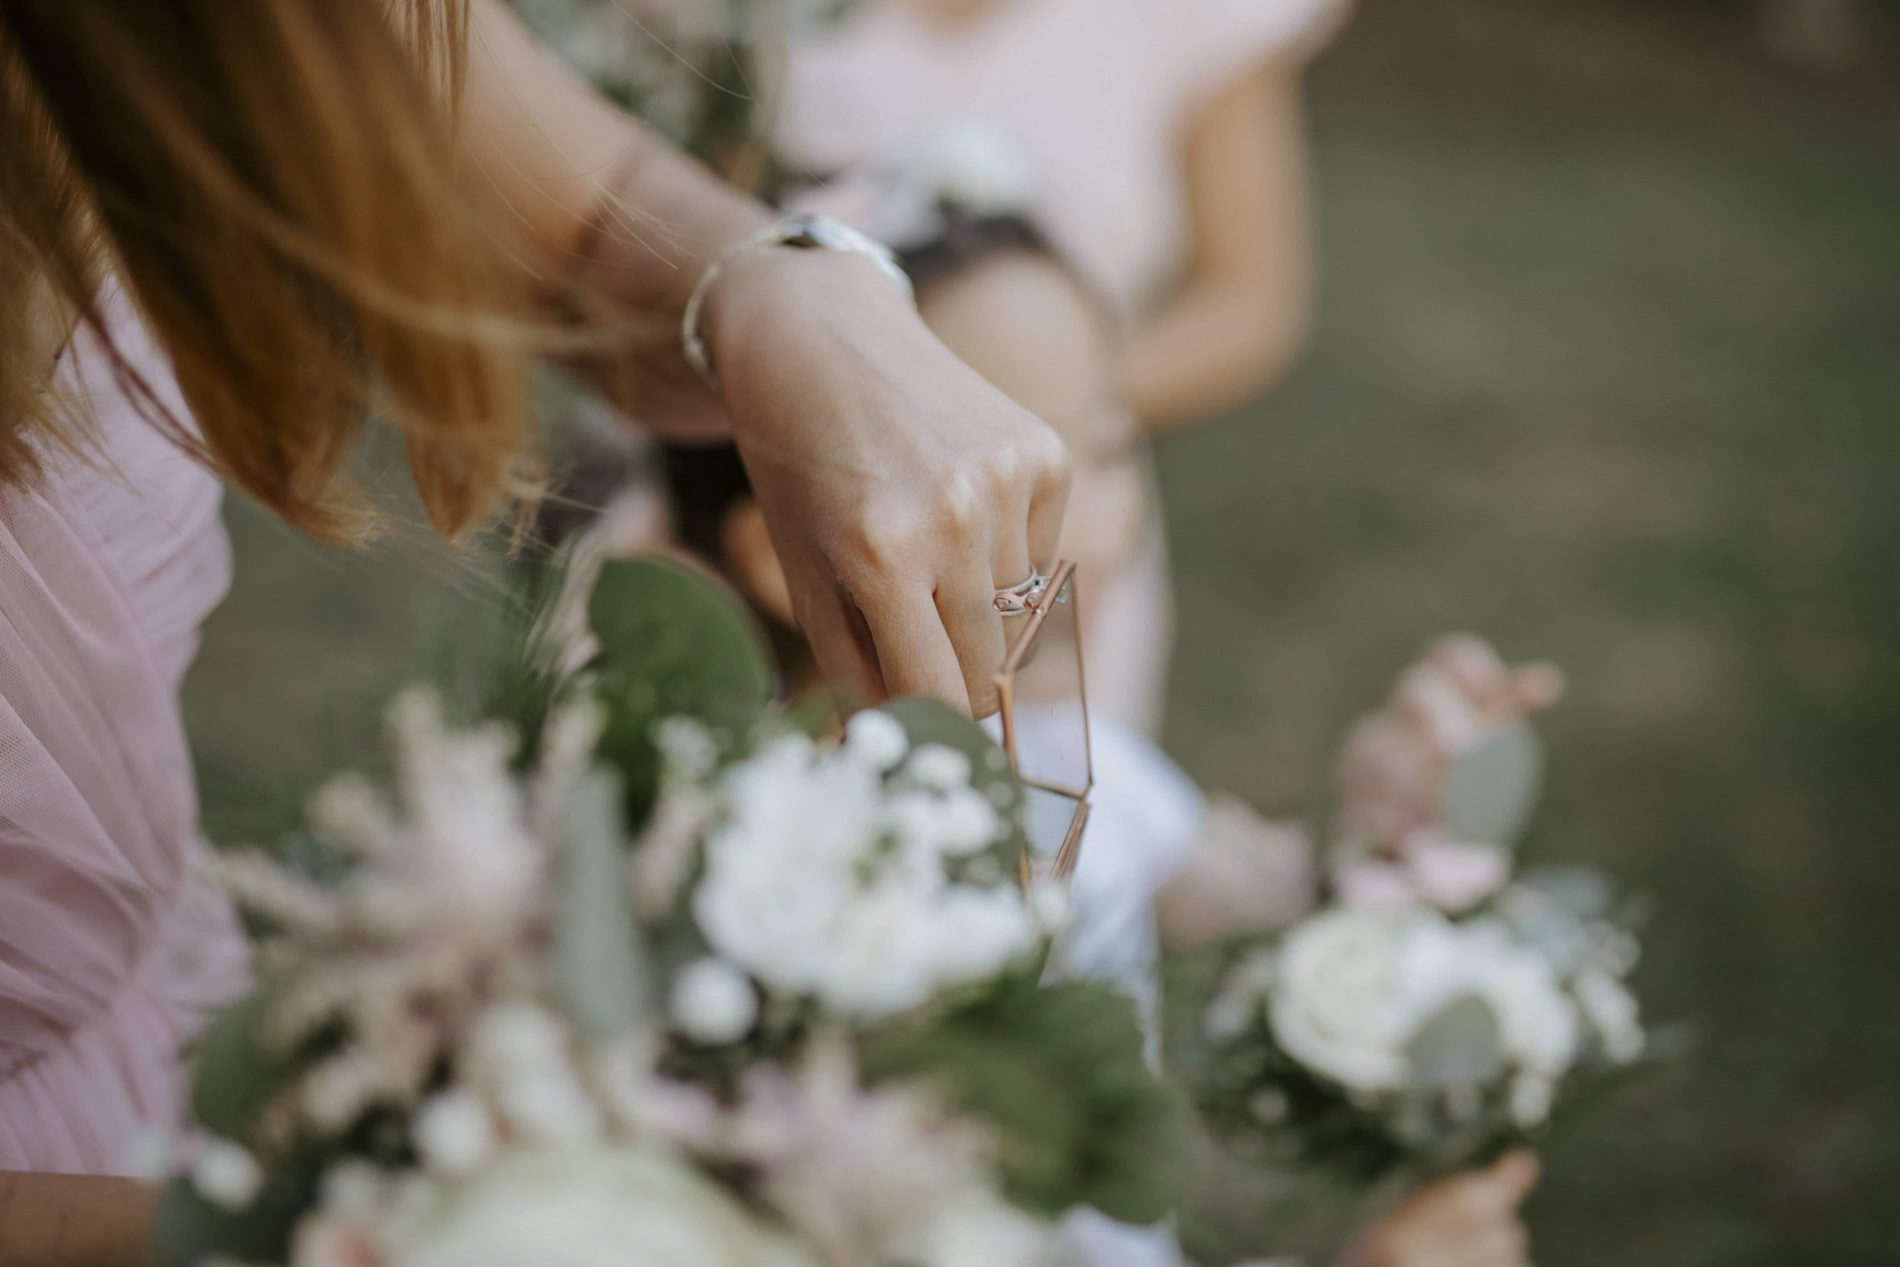 03-CelineSereivuth-86-obonheurdesdames-decoration-mariage-location-Jordane-Chaillou